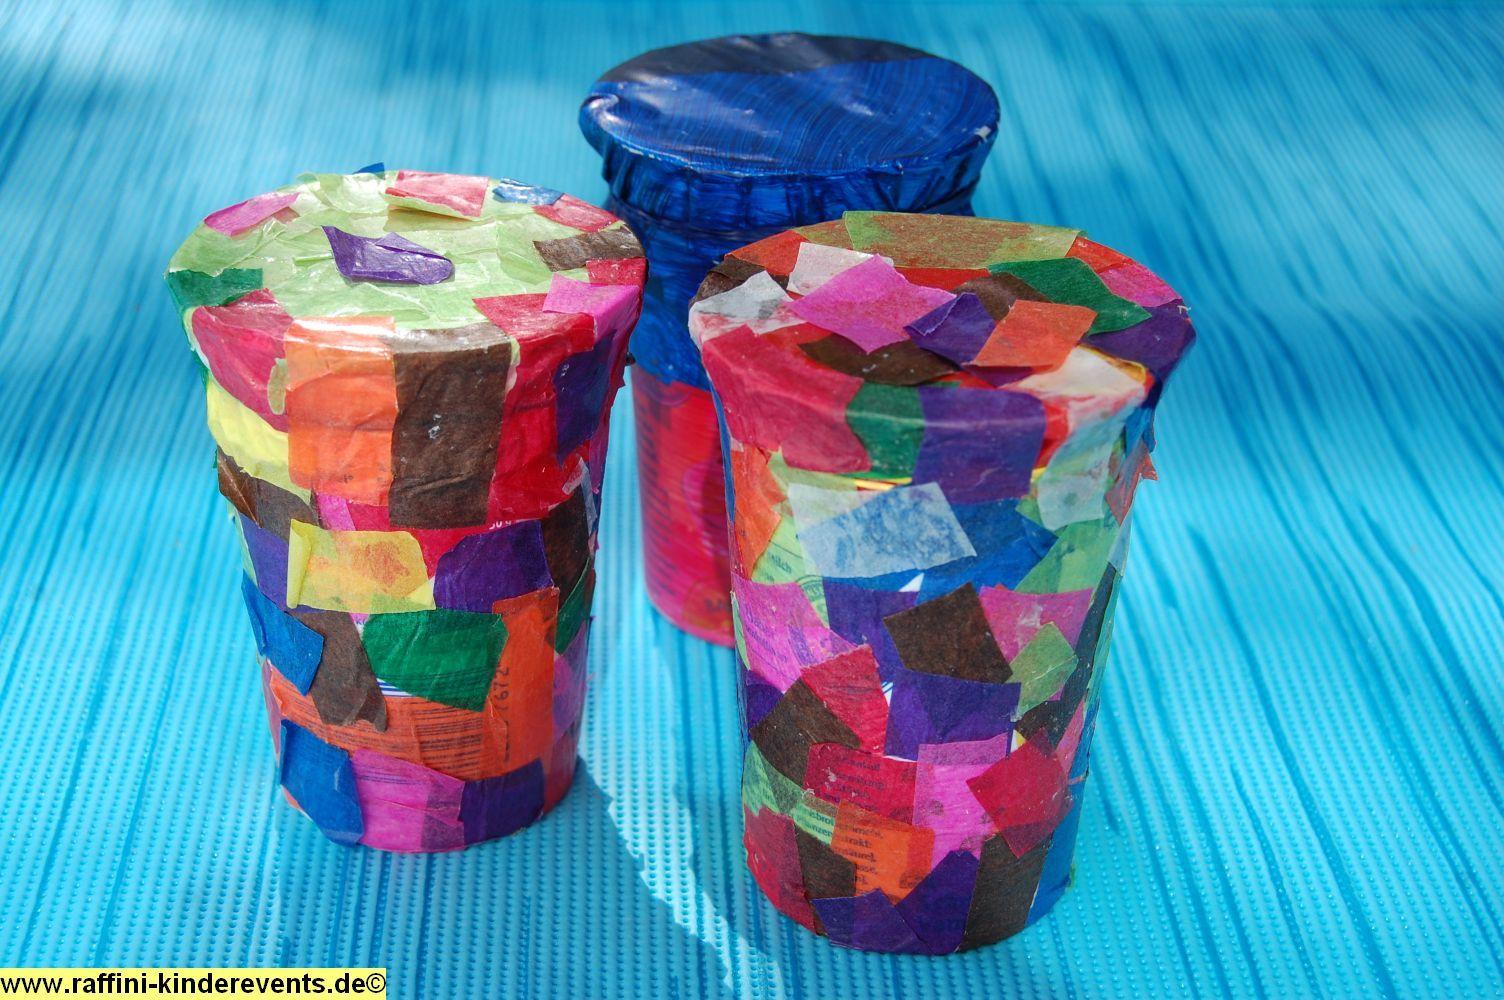 recycling basteln joghurtbecher trommel kindergarten pinterest basteln recycling basteln. Black Bedroom Furniture Sets. Home Design Ideas